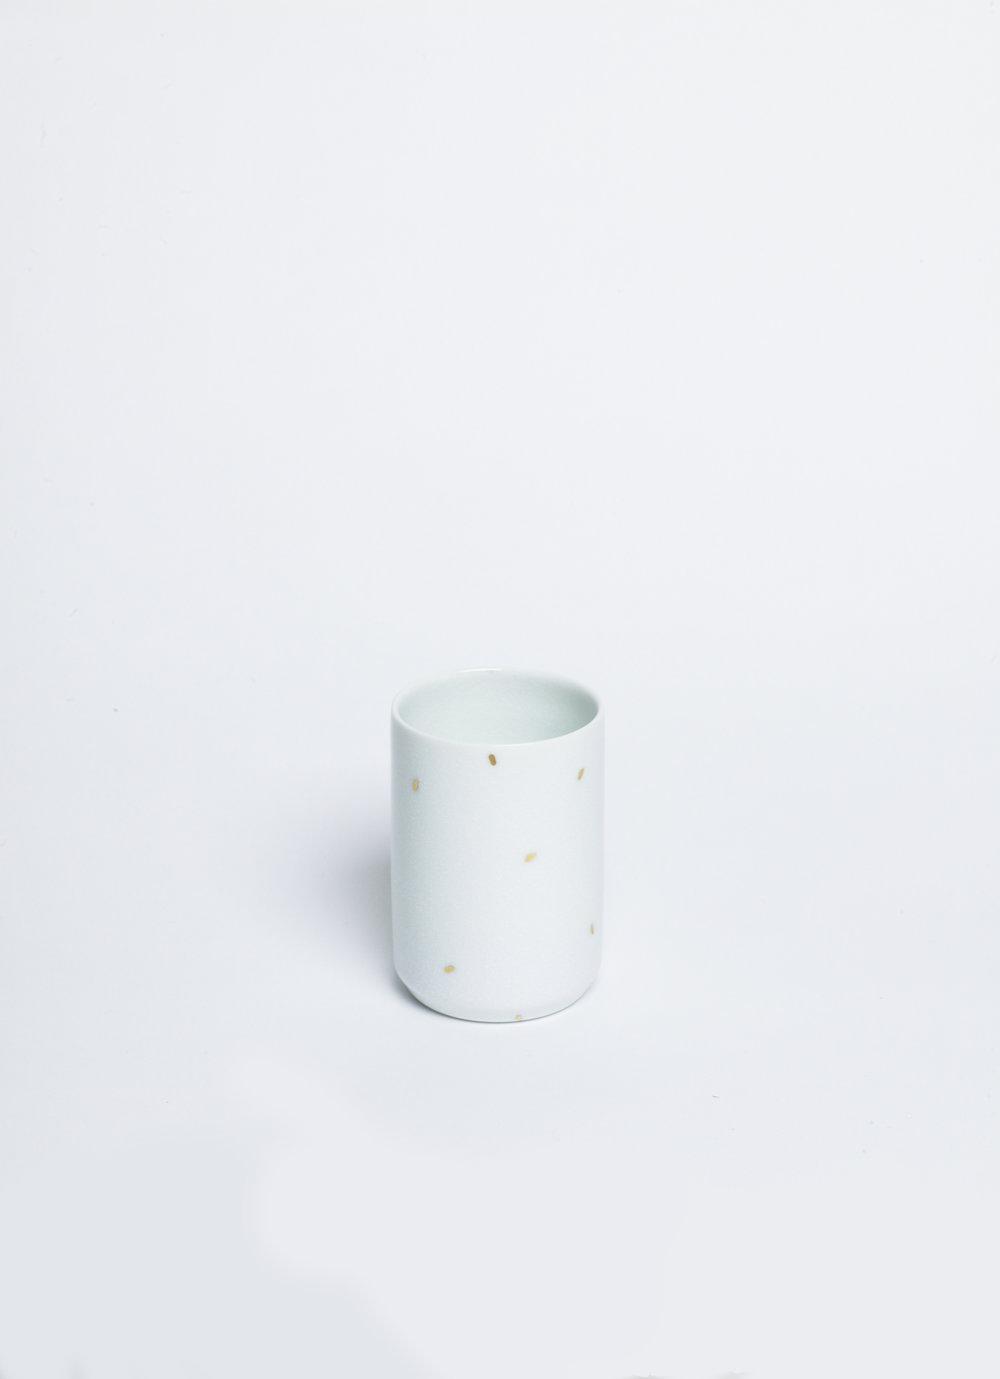 50a-b.White Porcelain Cup (3)